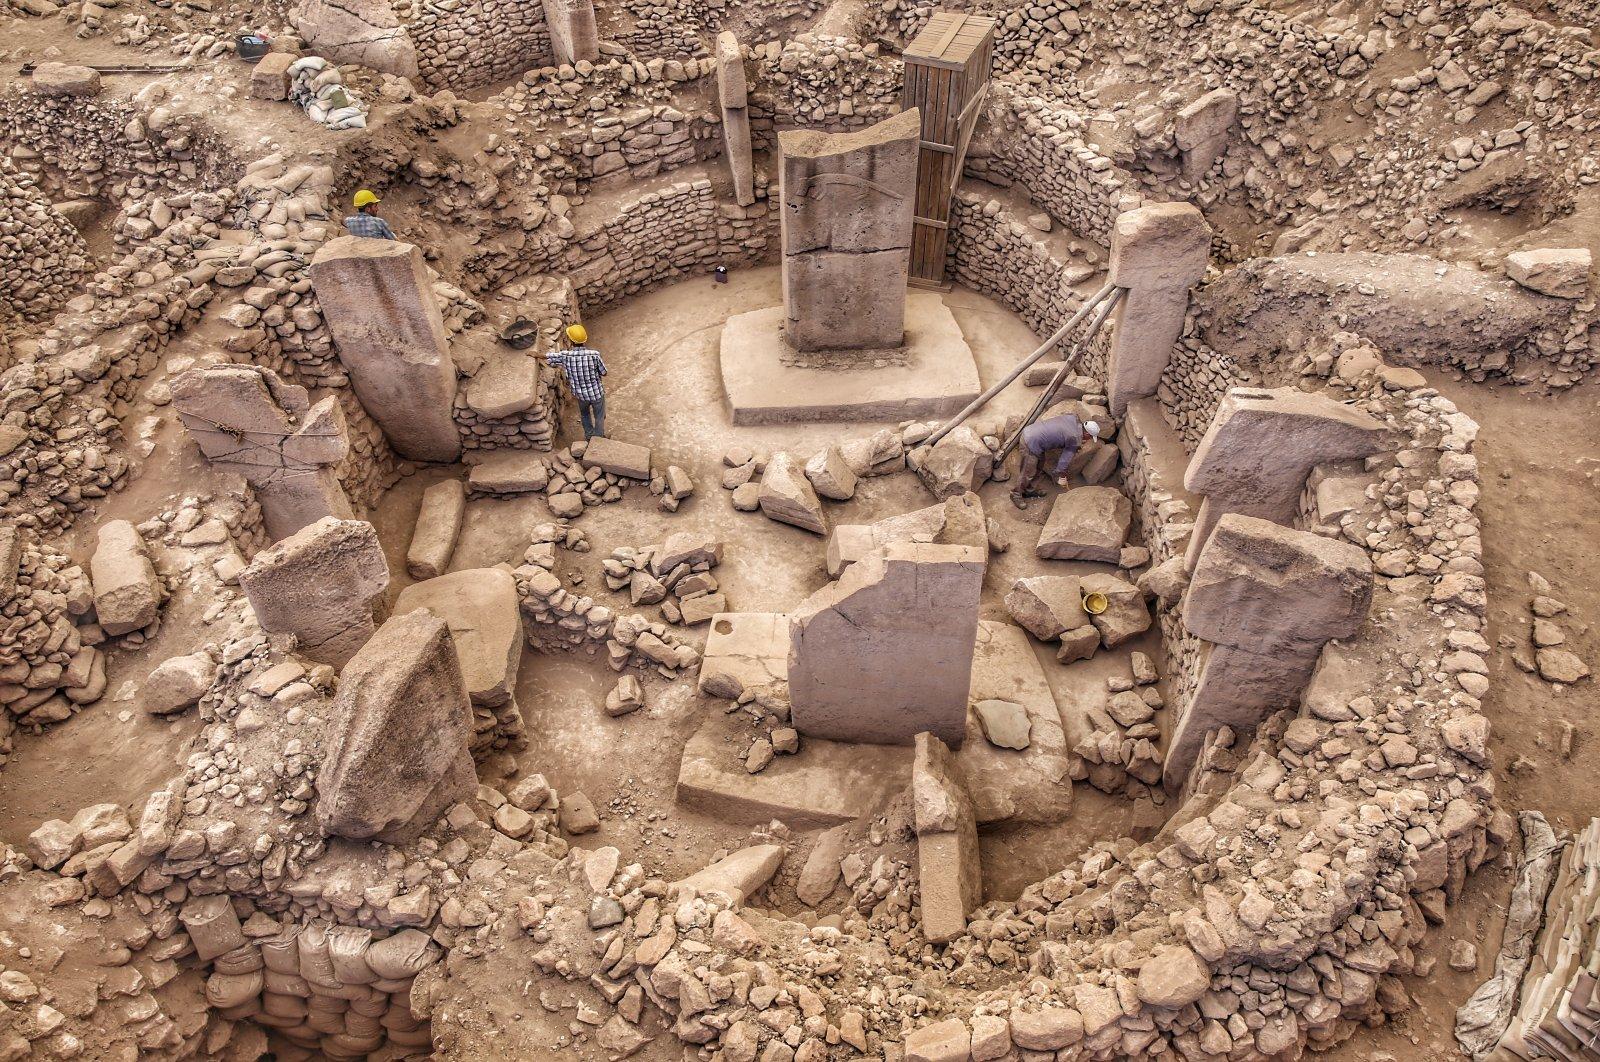 A photo from the Göbeklitepe archaeological site, Şanlıurfa, southeastern Turkey, Oct. 27, 2019. (PHOTO BY MURAT ŞENGÜL)